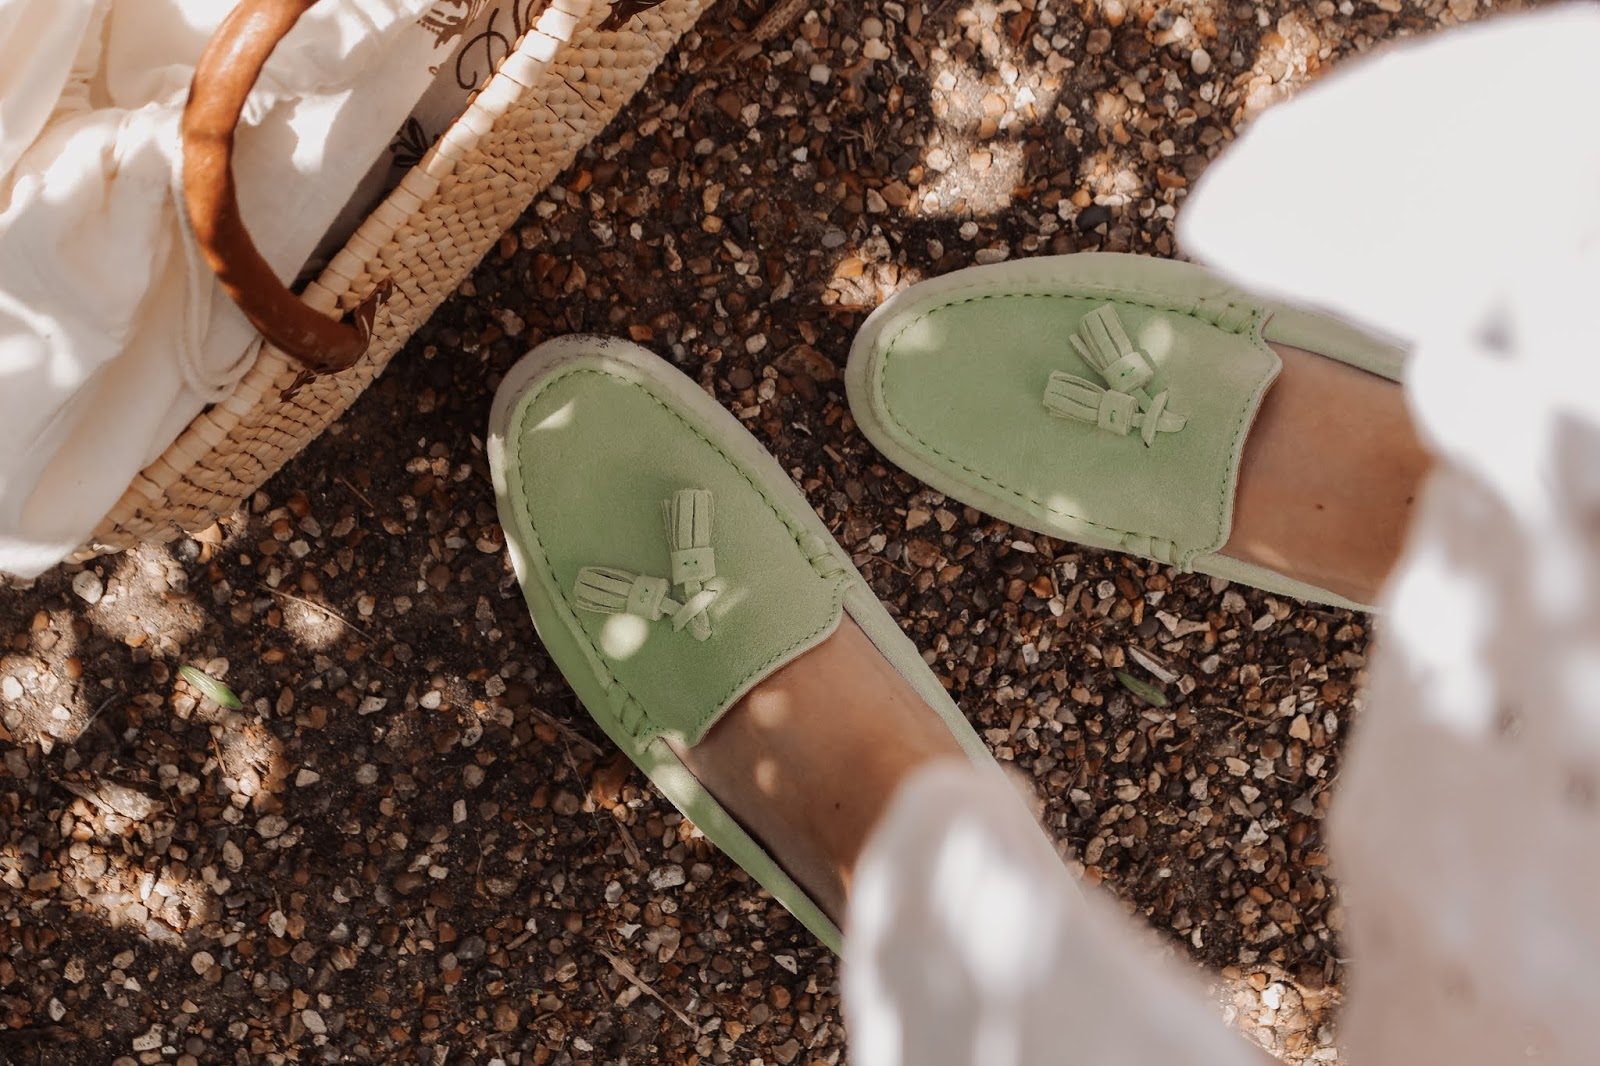 Hugs & Co Pistachio Green Driving Tassel Loafers